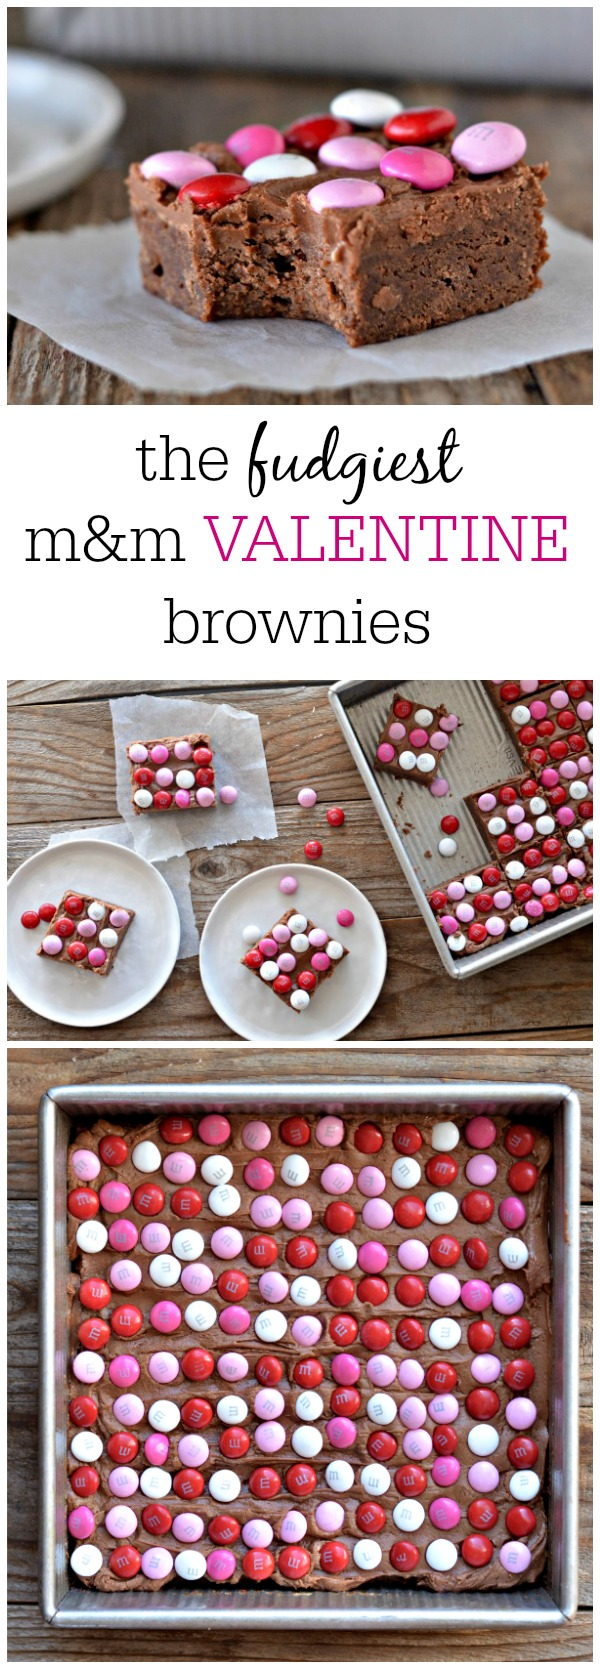 m&m Valentine Brownies | mountainmamacooks.com